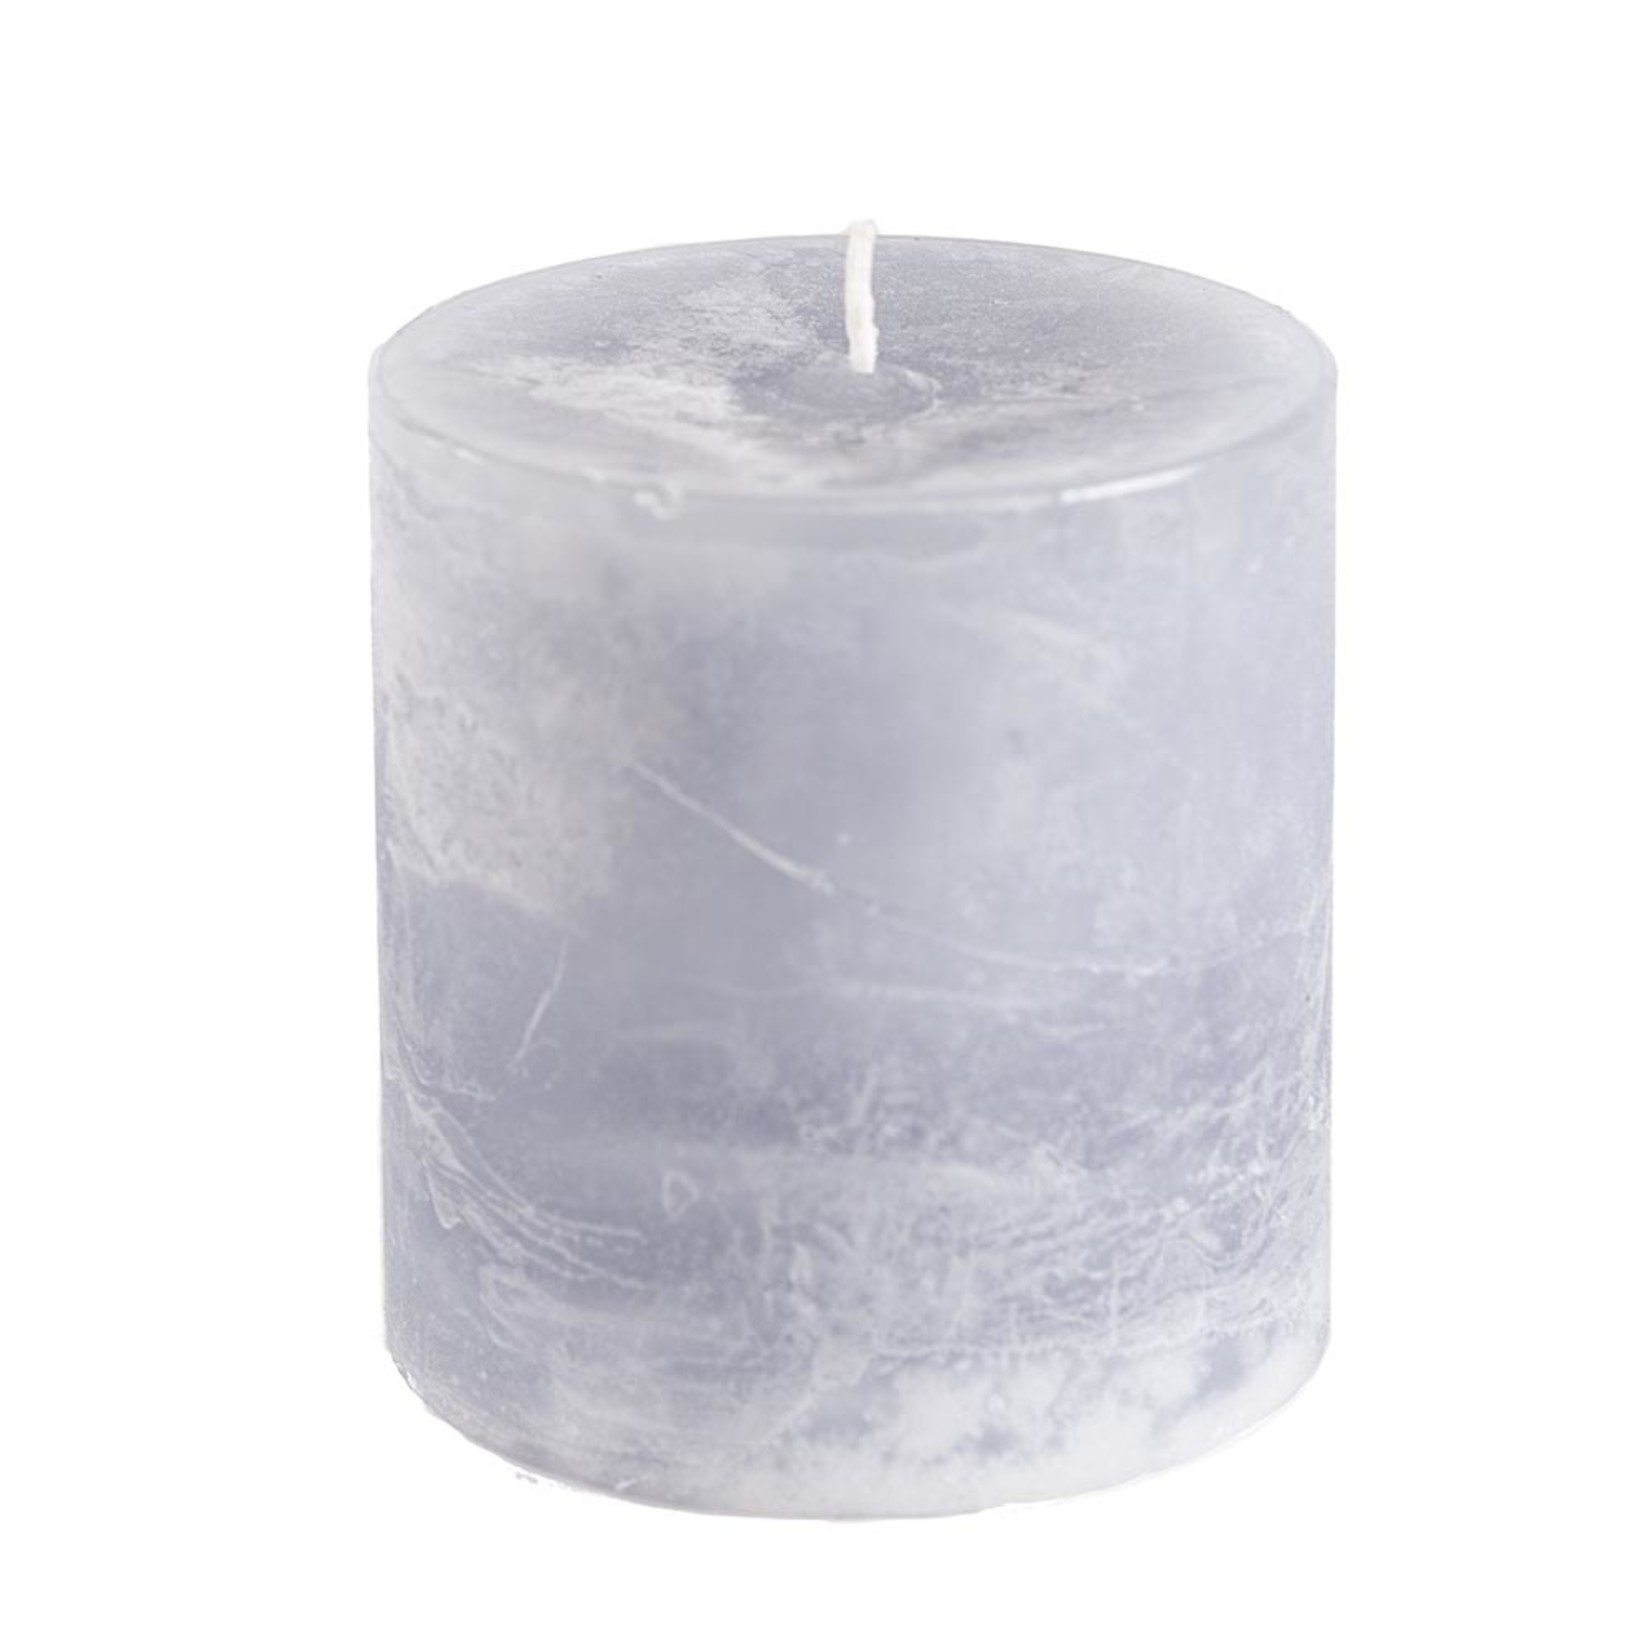 Home Society Pillar Candle 9x10cm Grey